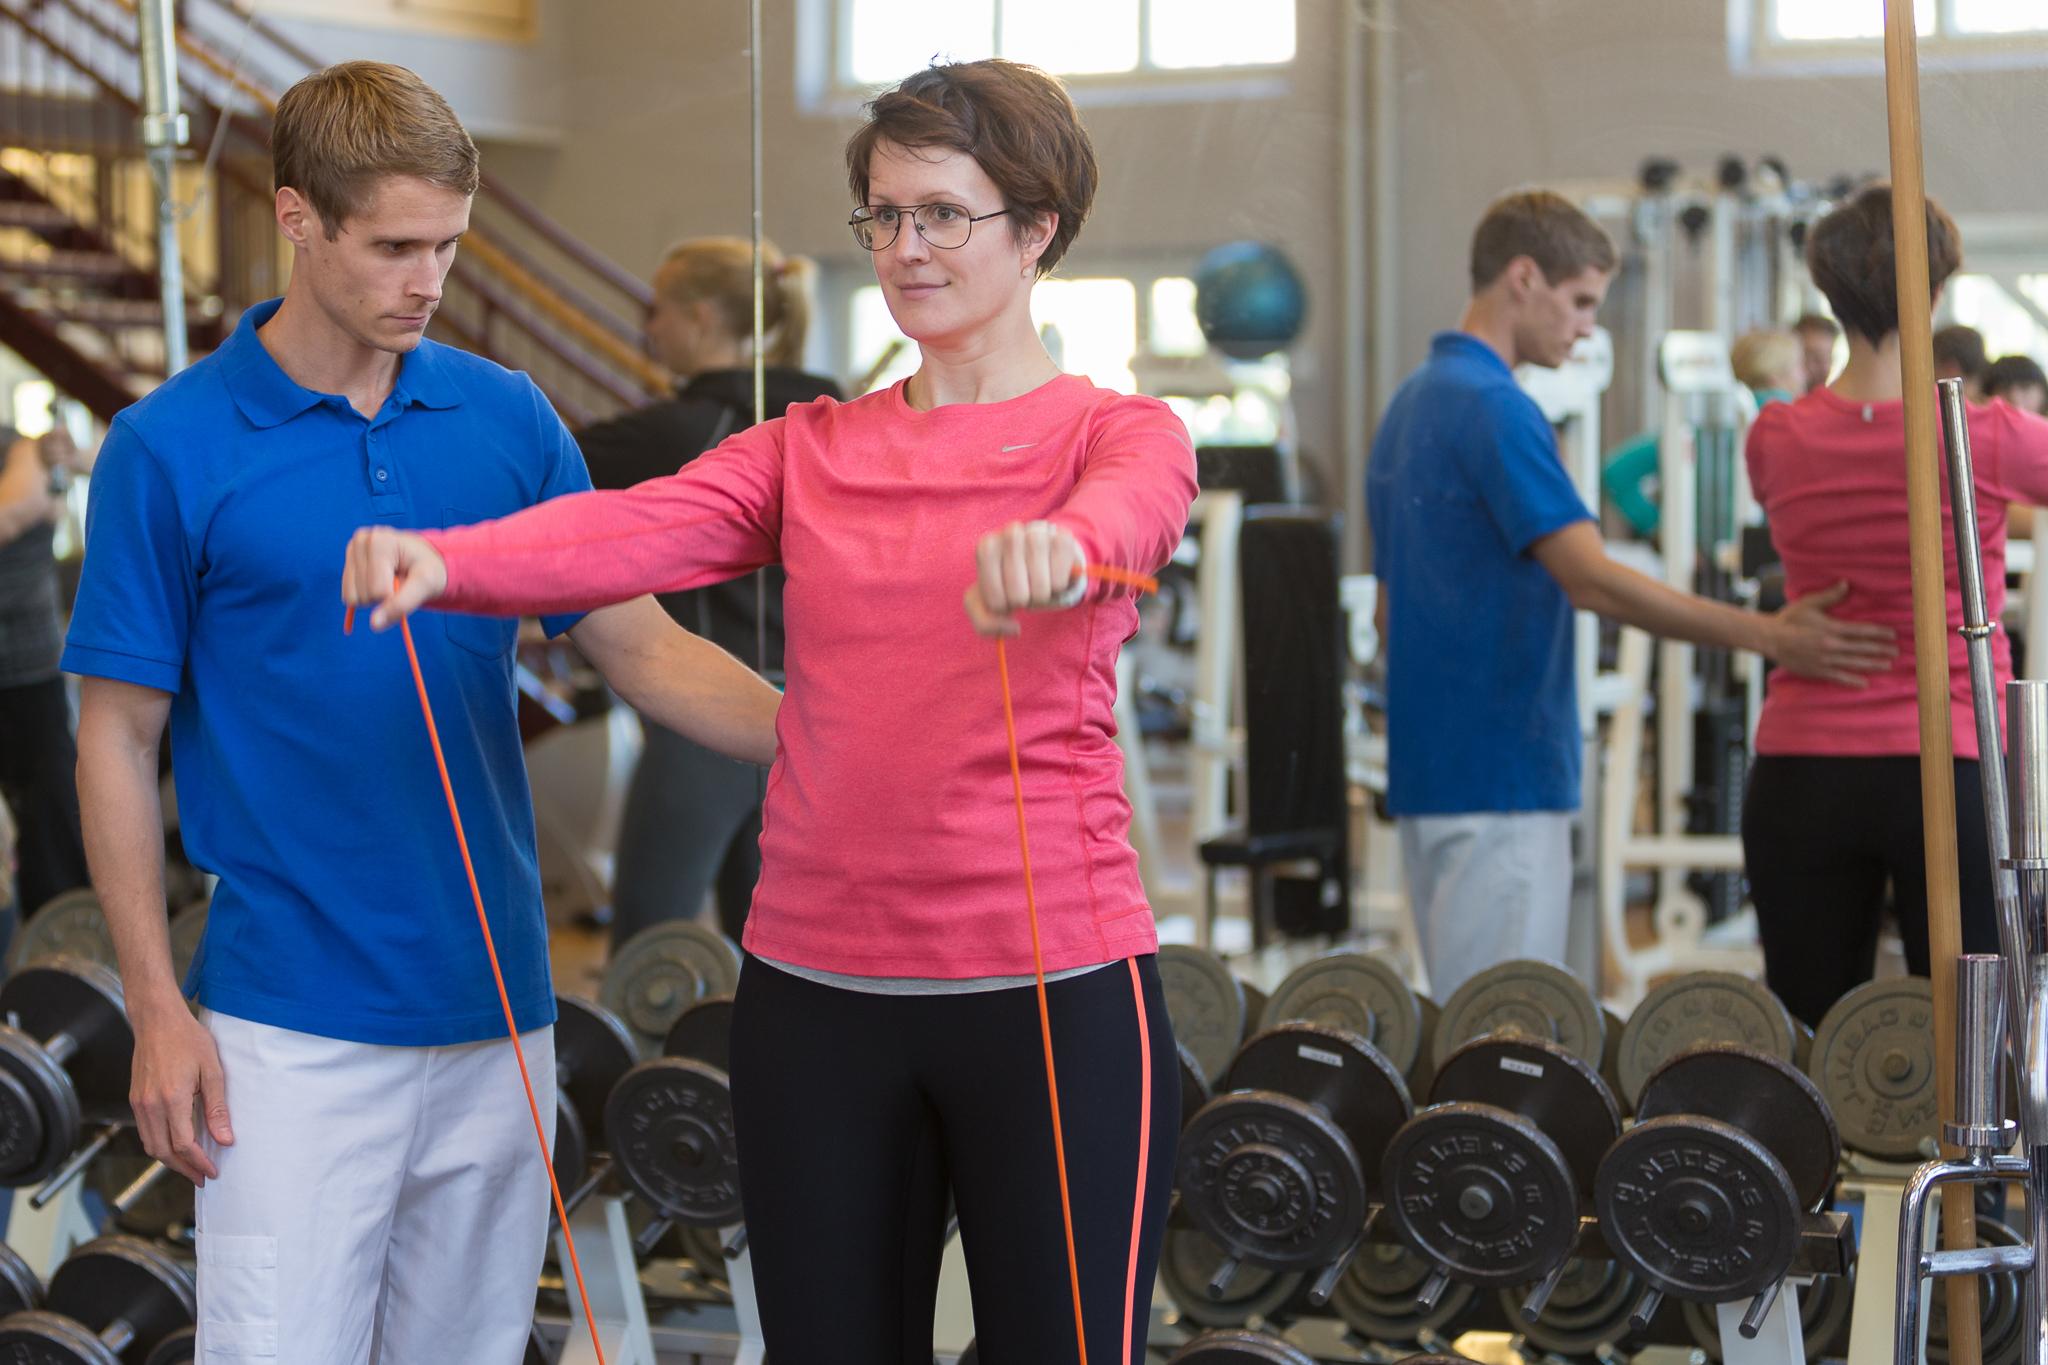 Fysioterapeut behandlar ryggsmärta